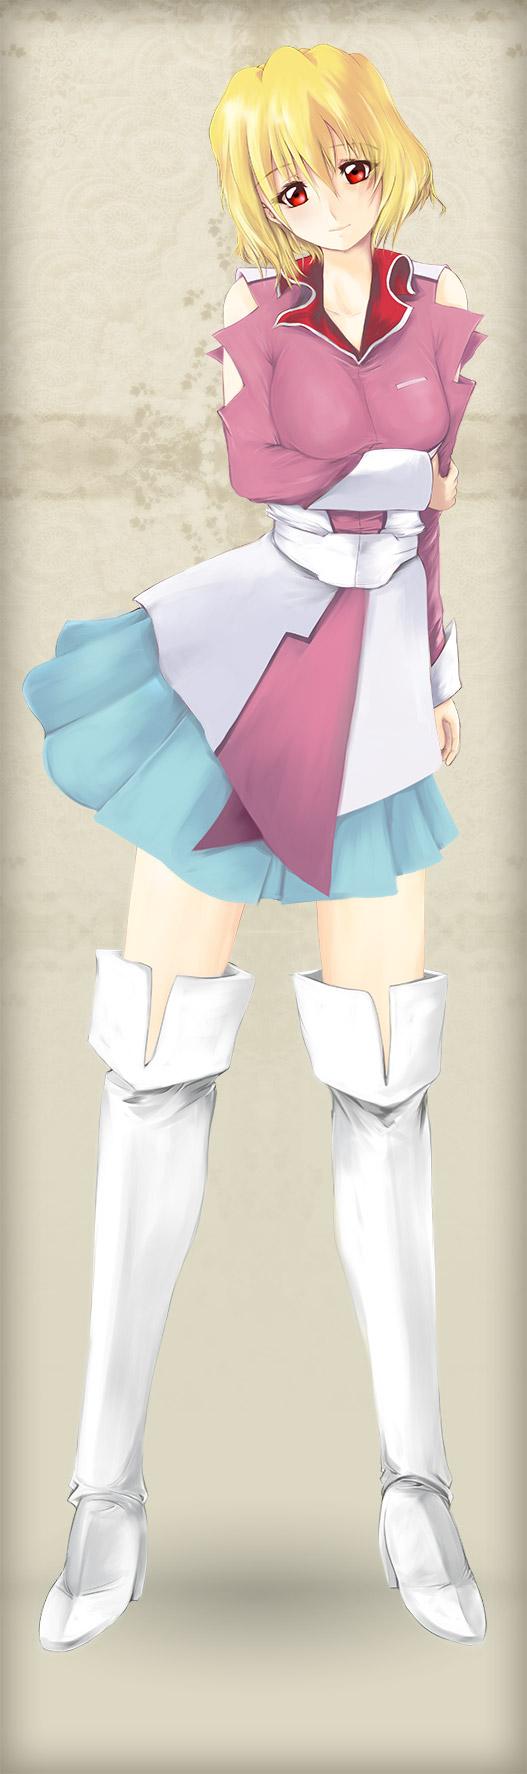 Stella Loussier | Gundam Seed Destiny